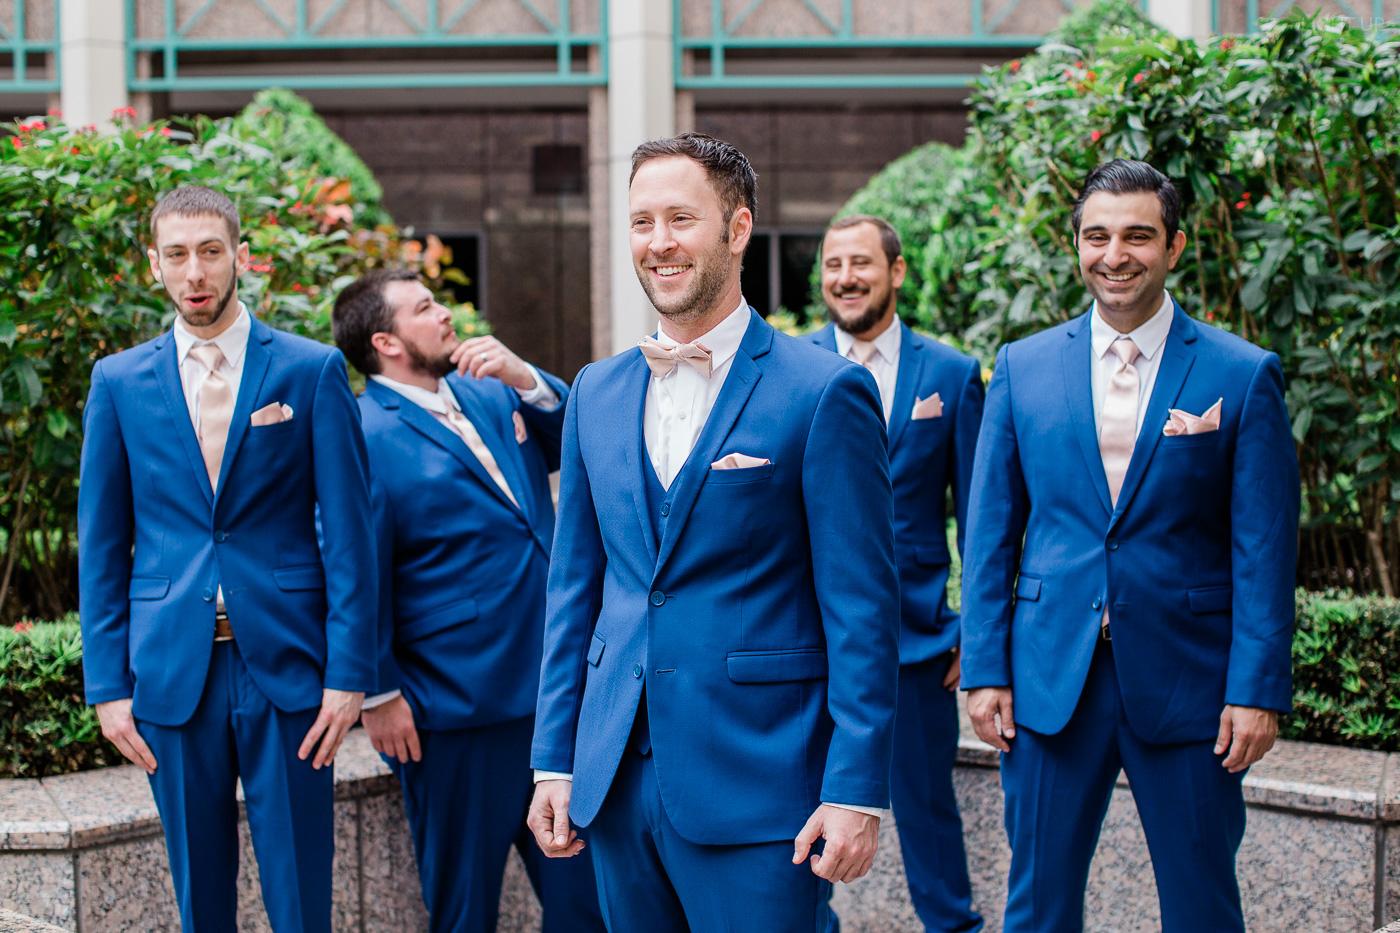 Grand-Bohemian-Hotel-Wedding-in-Orlando-27.jpg